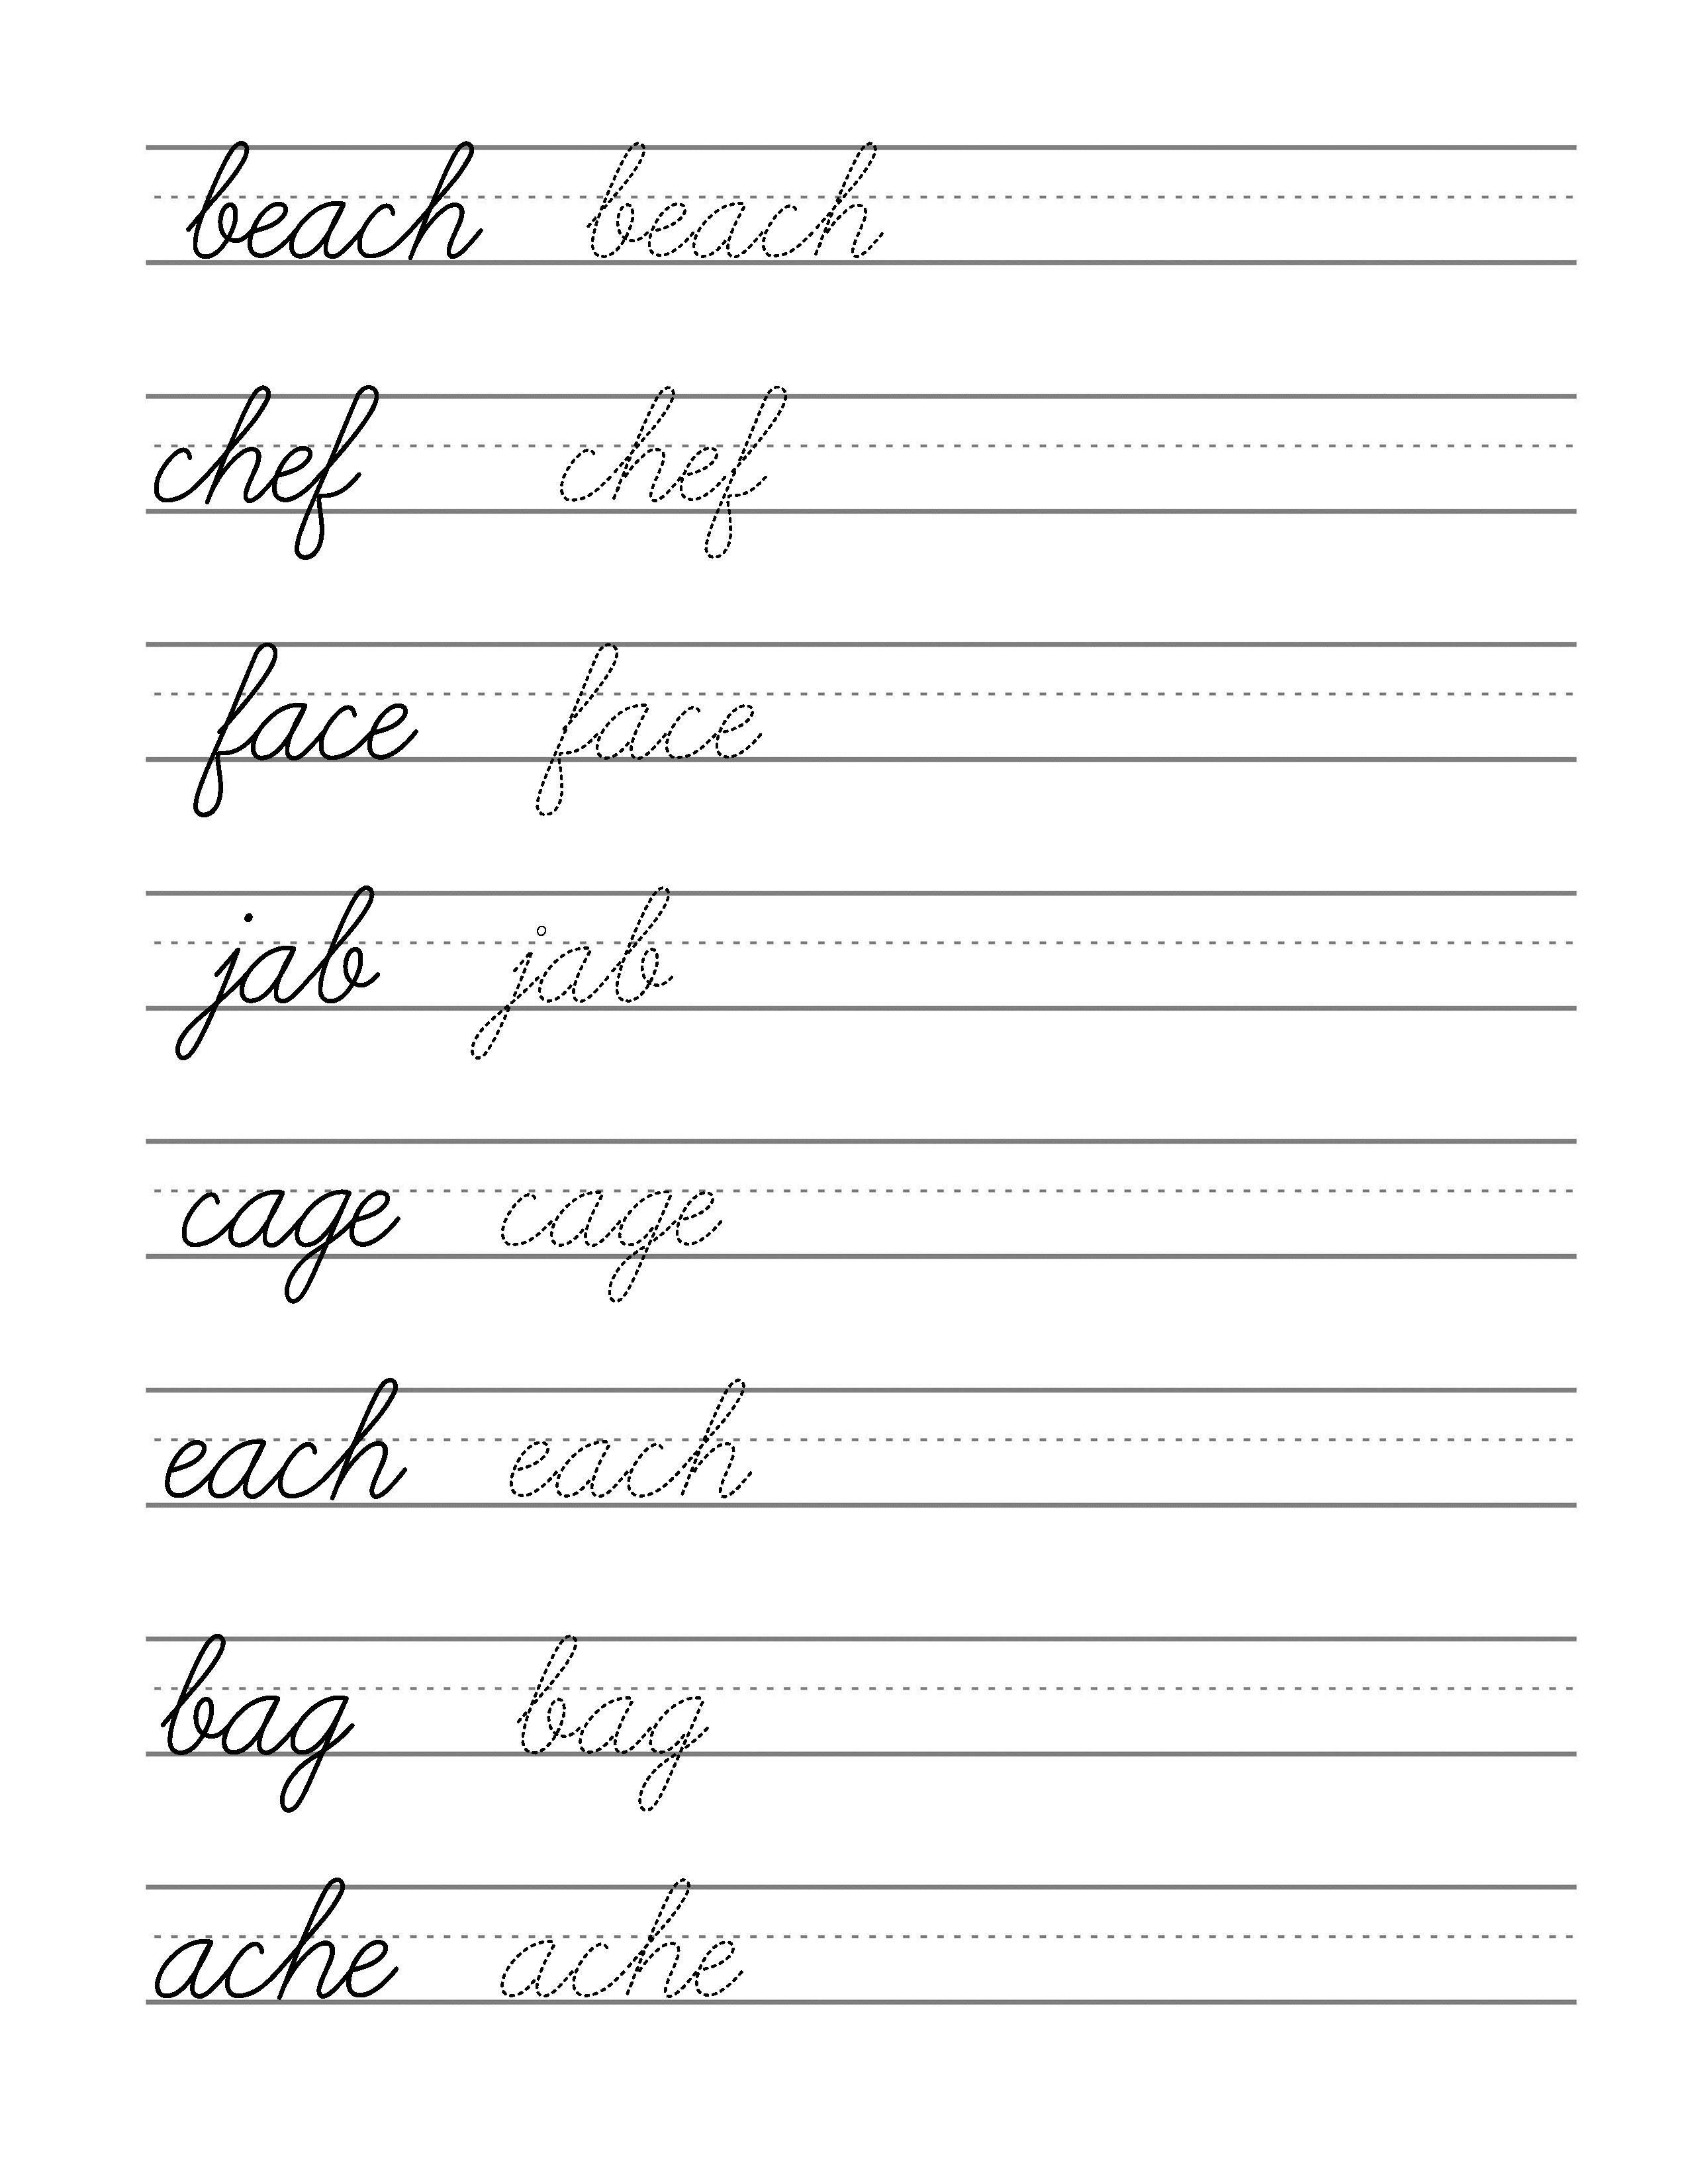 Free Beginning Cursive - Writing Template Part 3   Writing   Writing - Free Printable Cursive Writing Paragraphs